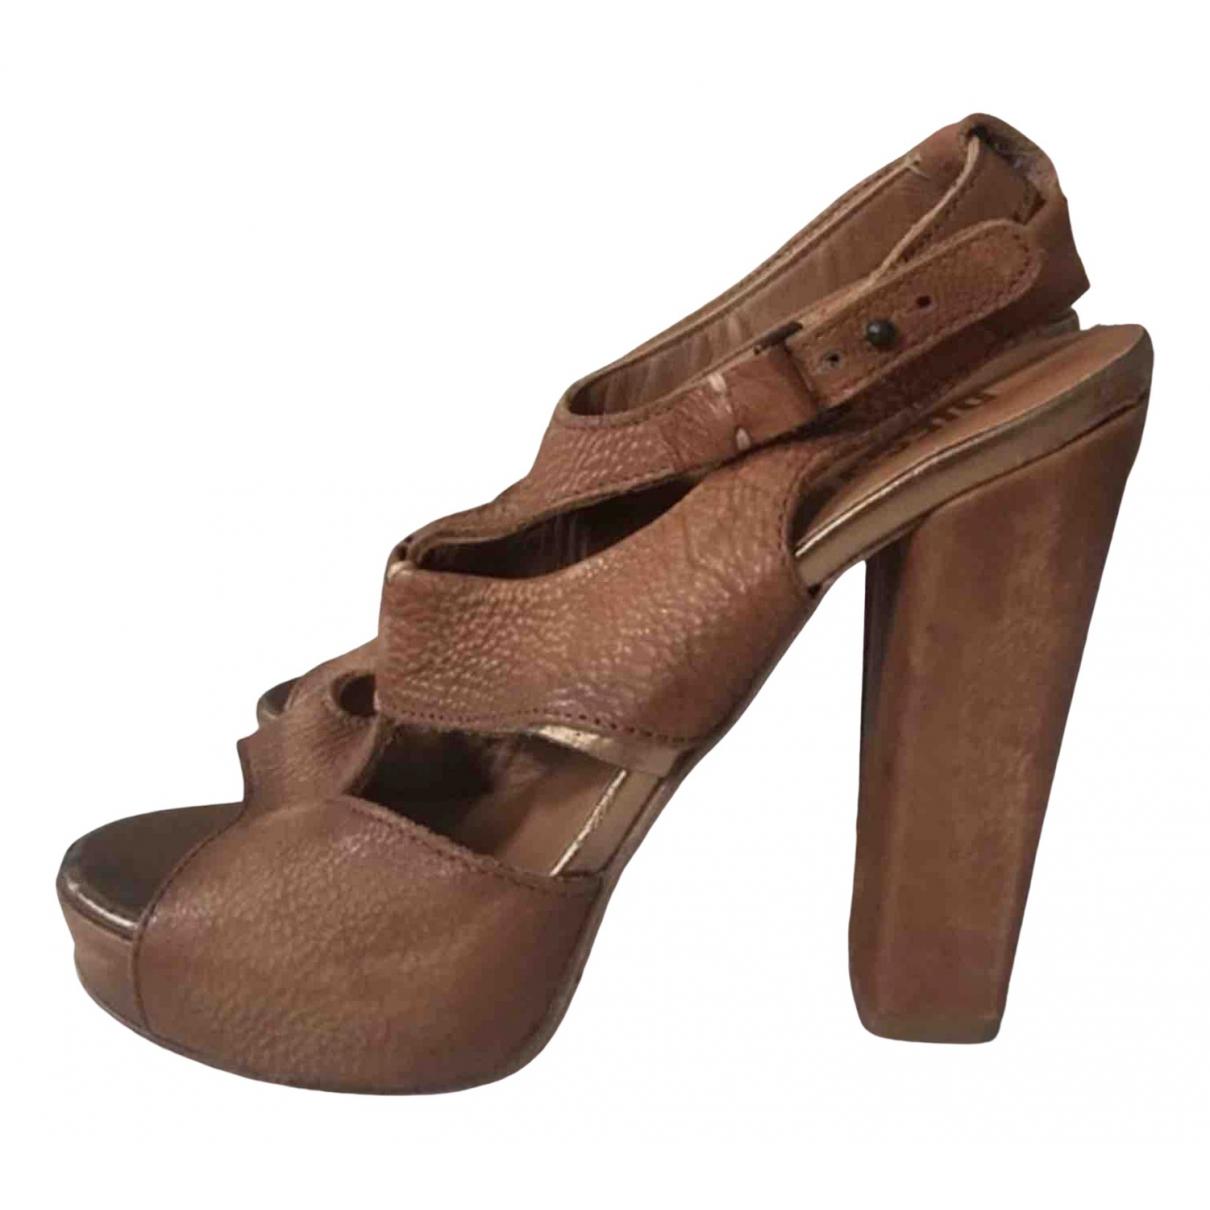 Diesel Black Gold - Sandales   pour femme en cuir - camel